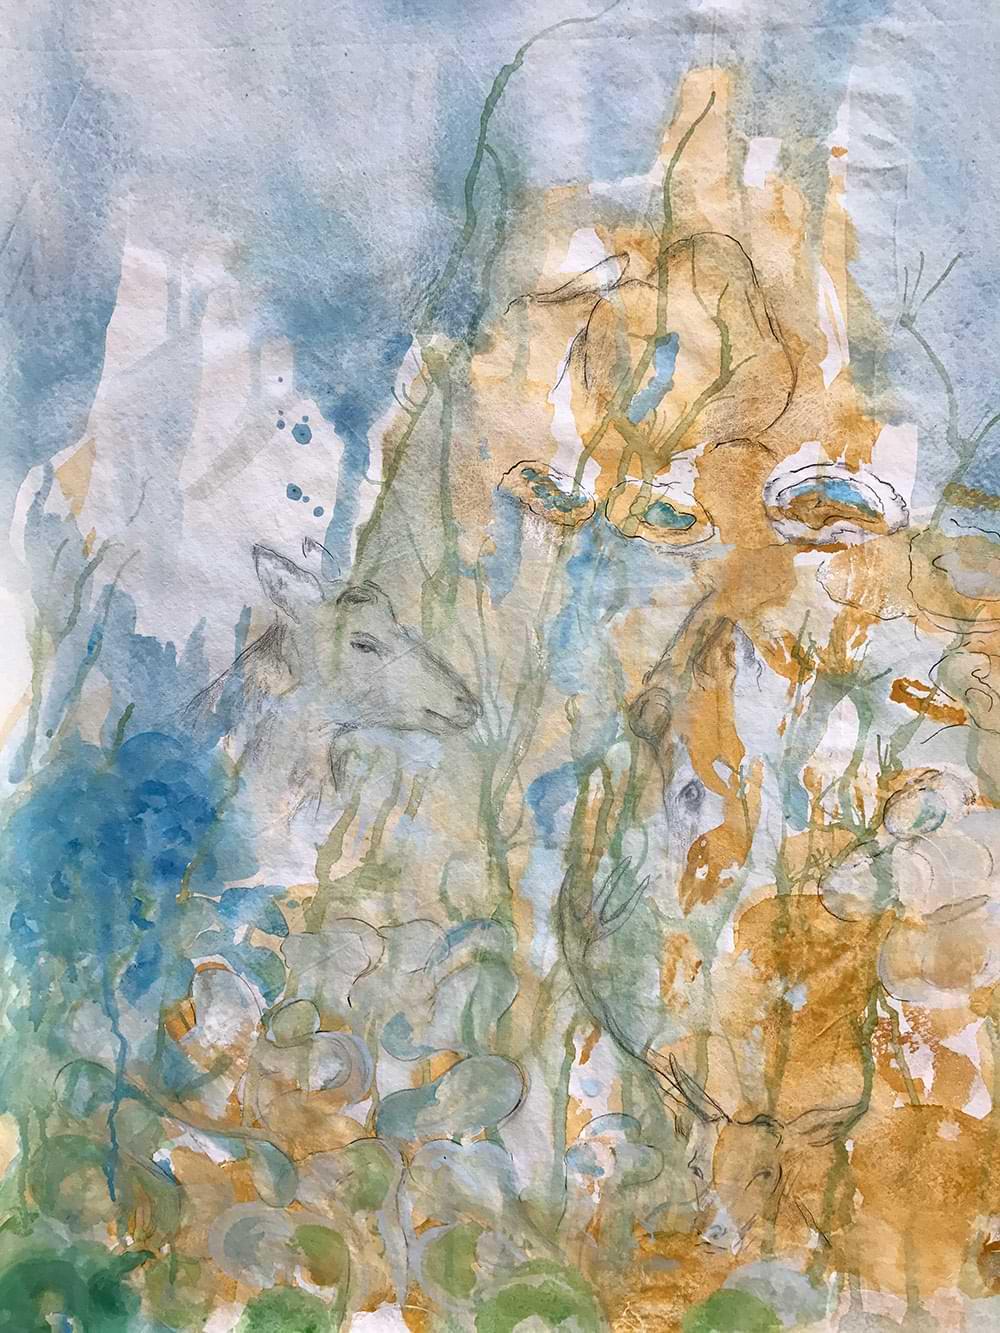 christianehaag kuenstlerin malerei painting urbandeer urbannature-art acrylicpainting